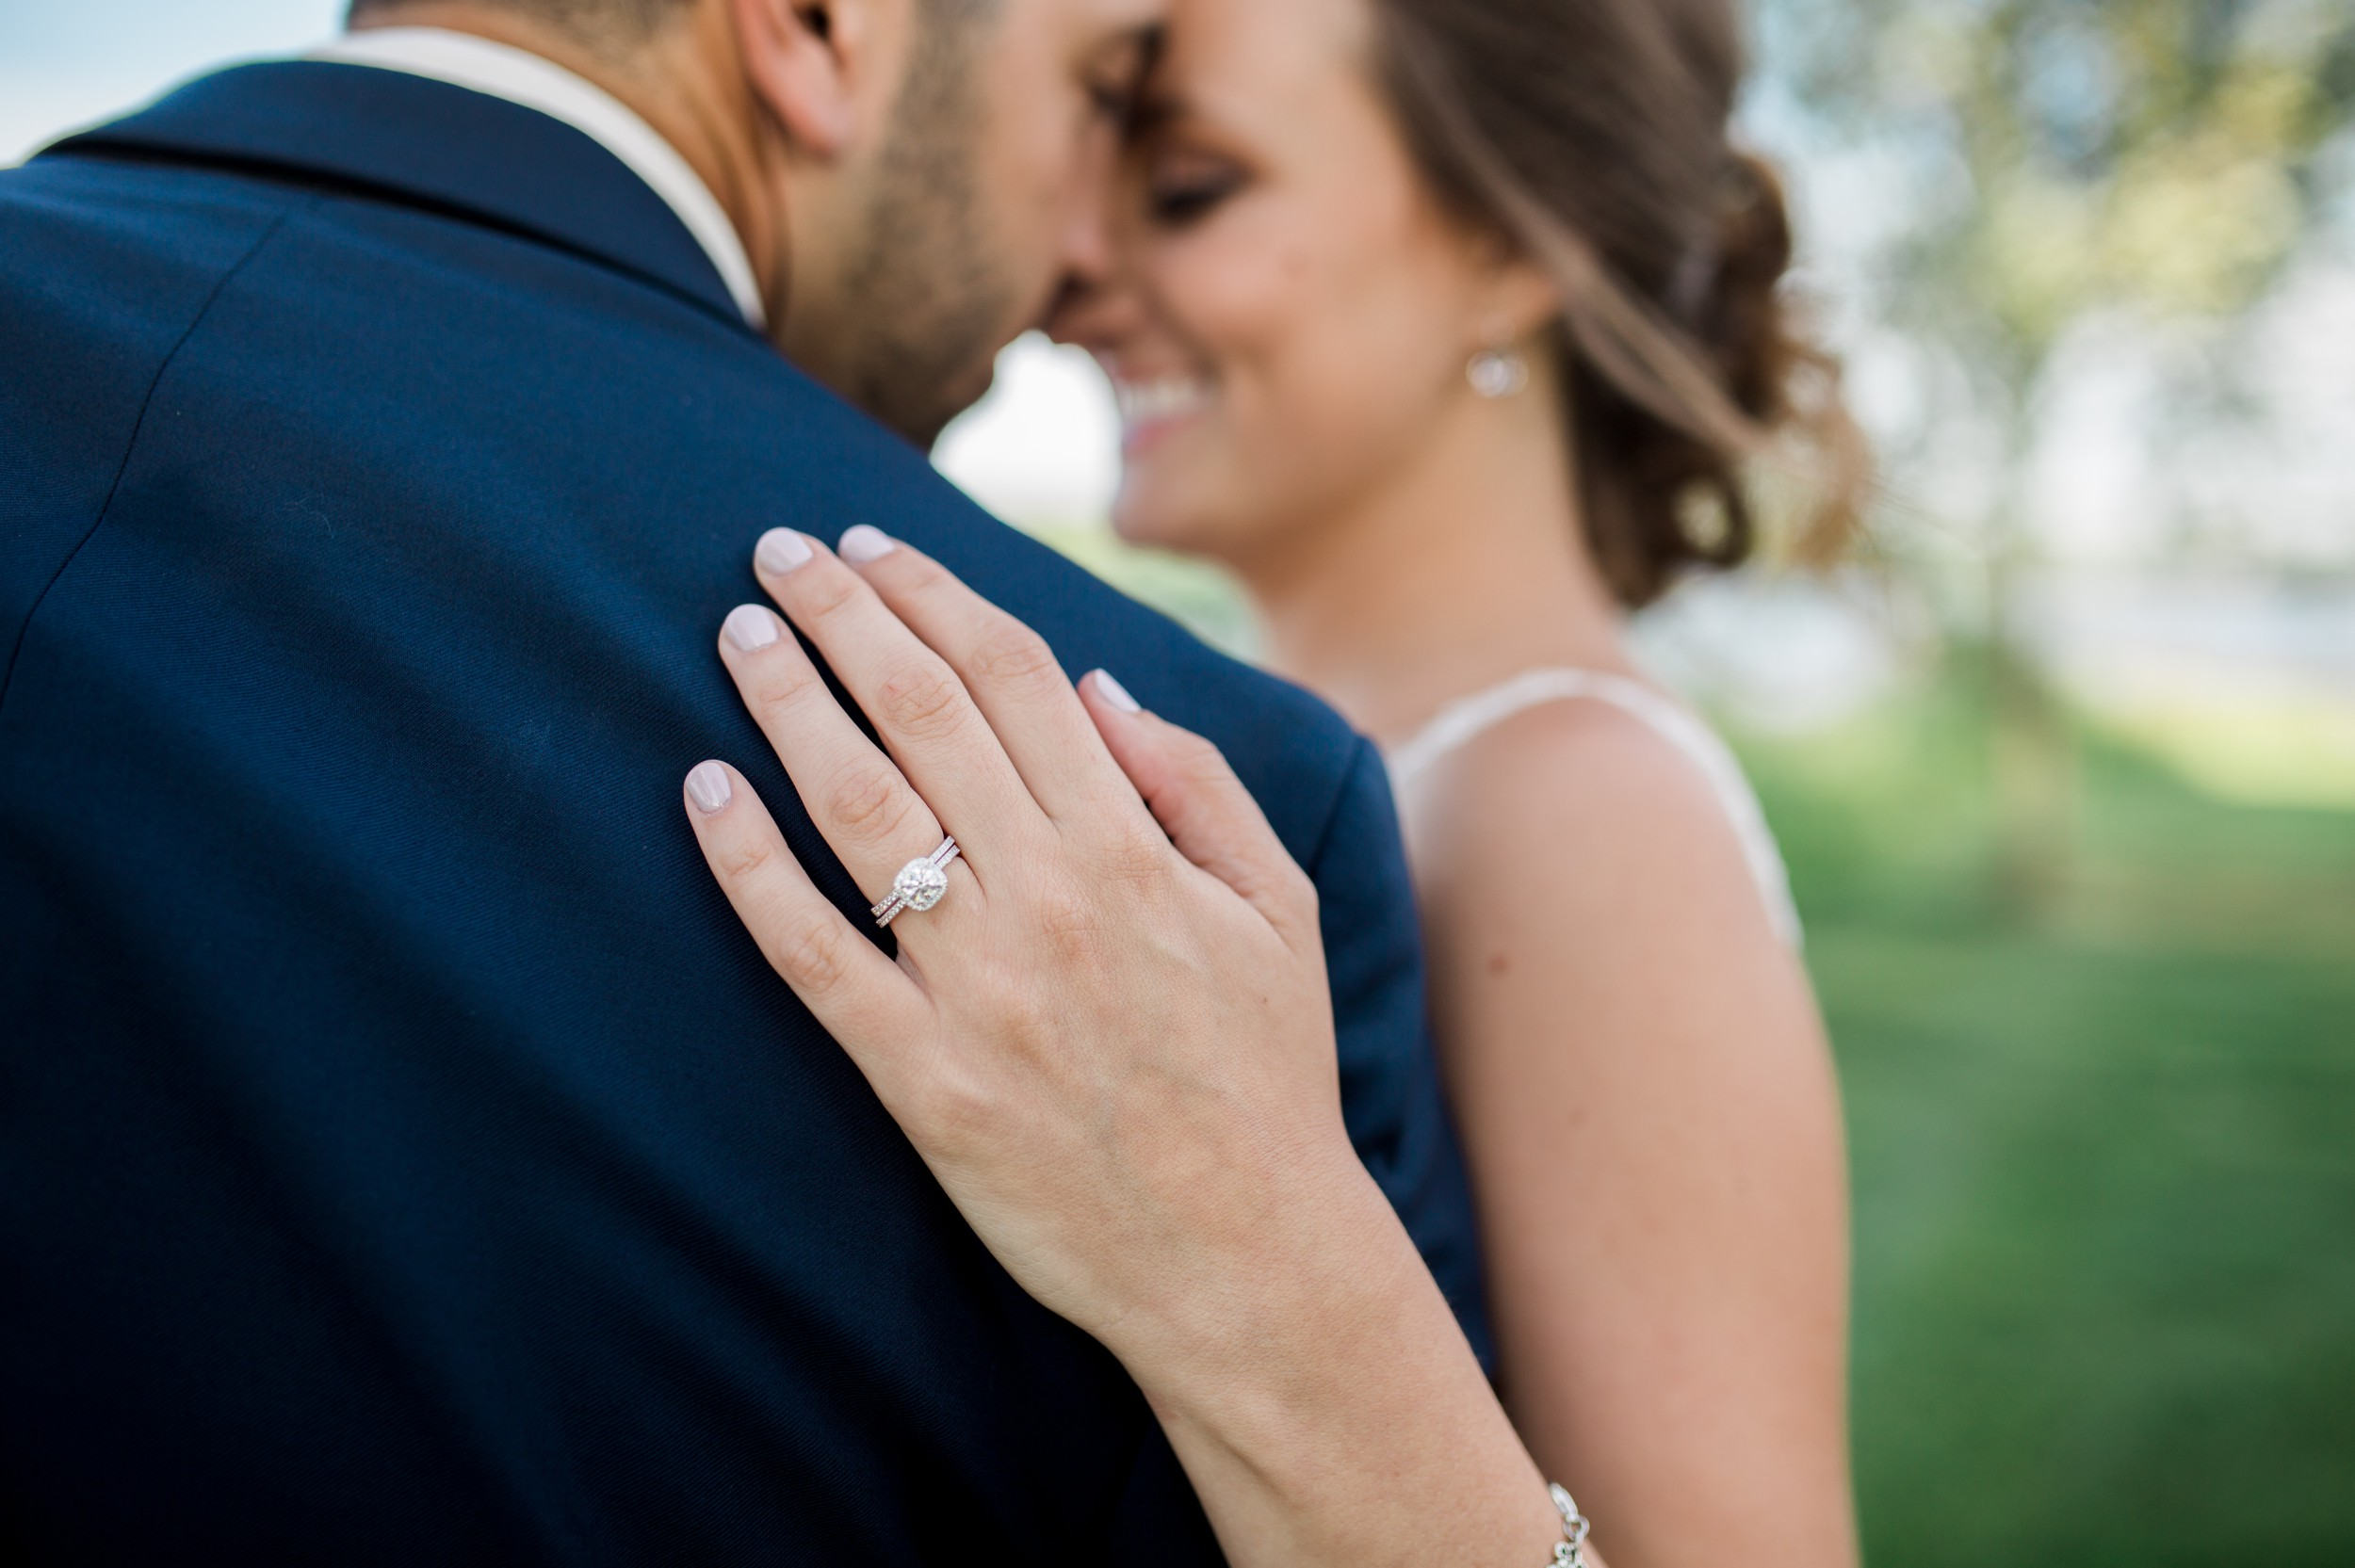 Nick-and-martina-pinelake-vinyards-wedding-columbiana-ohio-tracylynn-photography 16.jpg